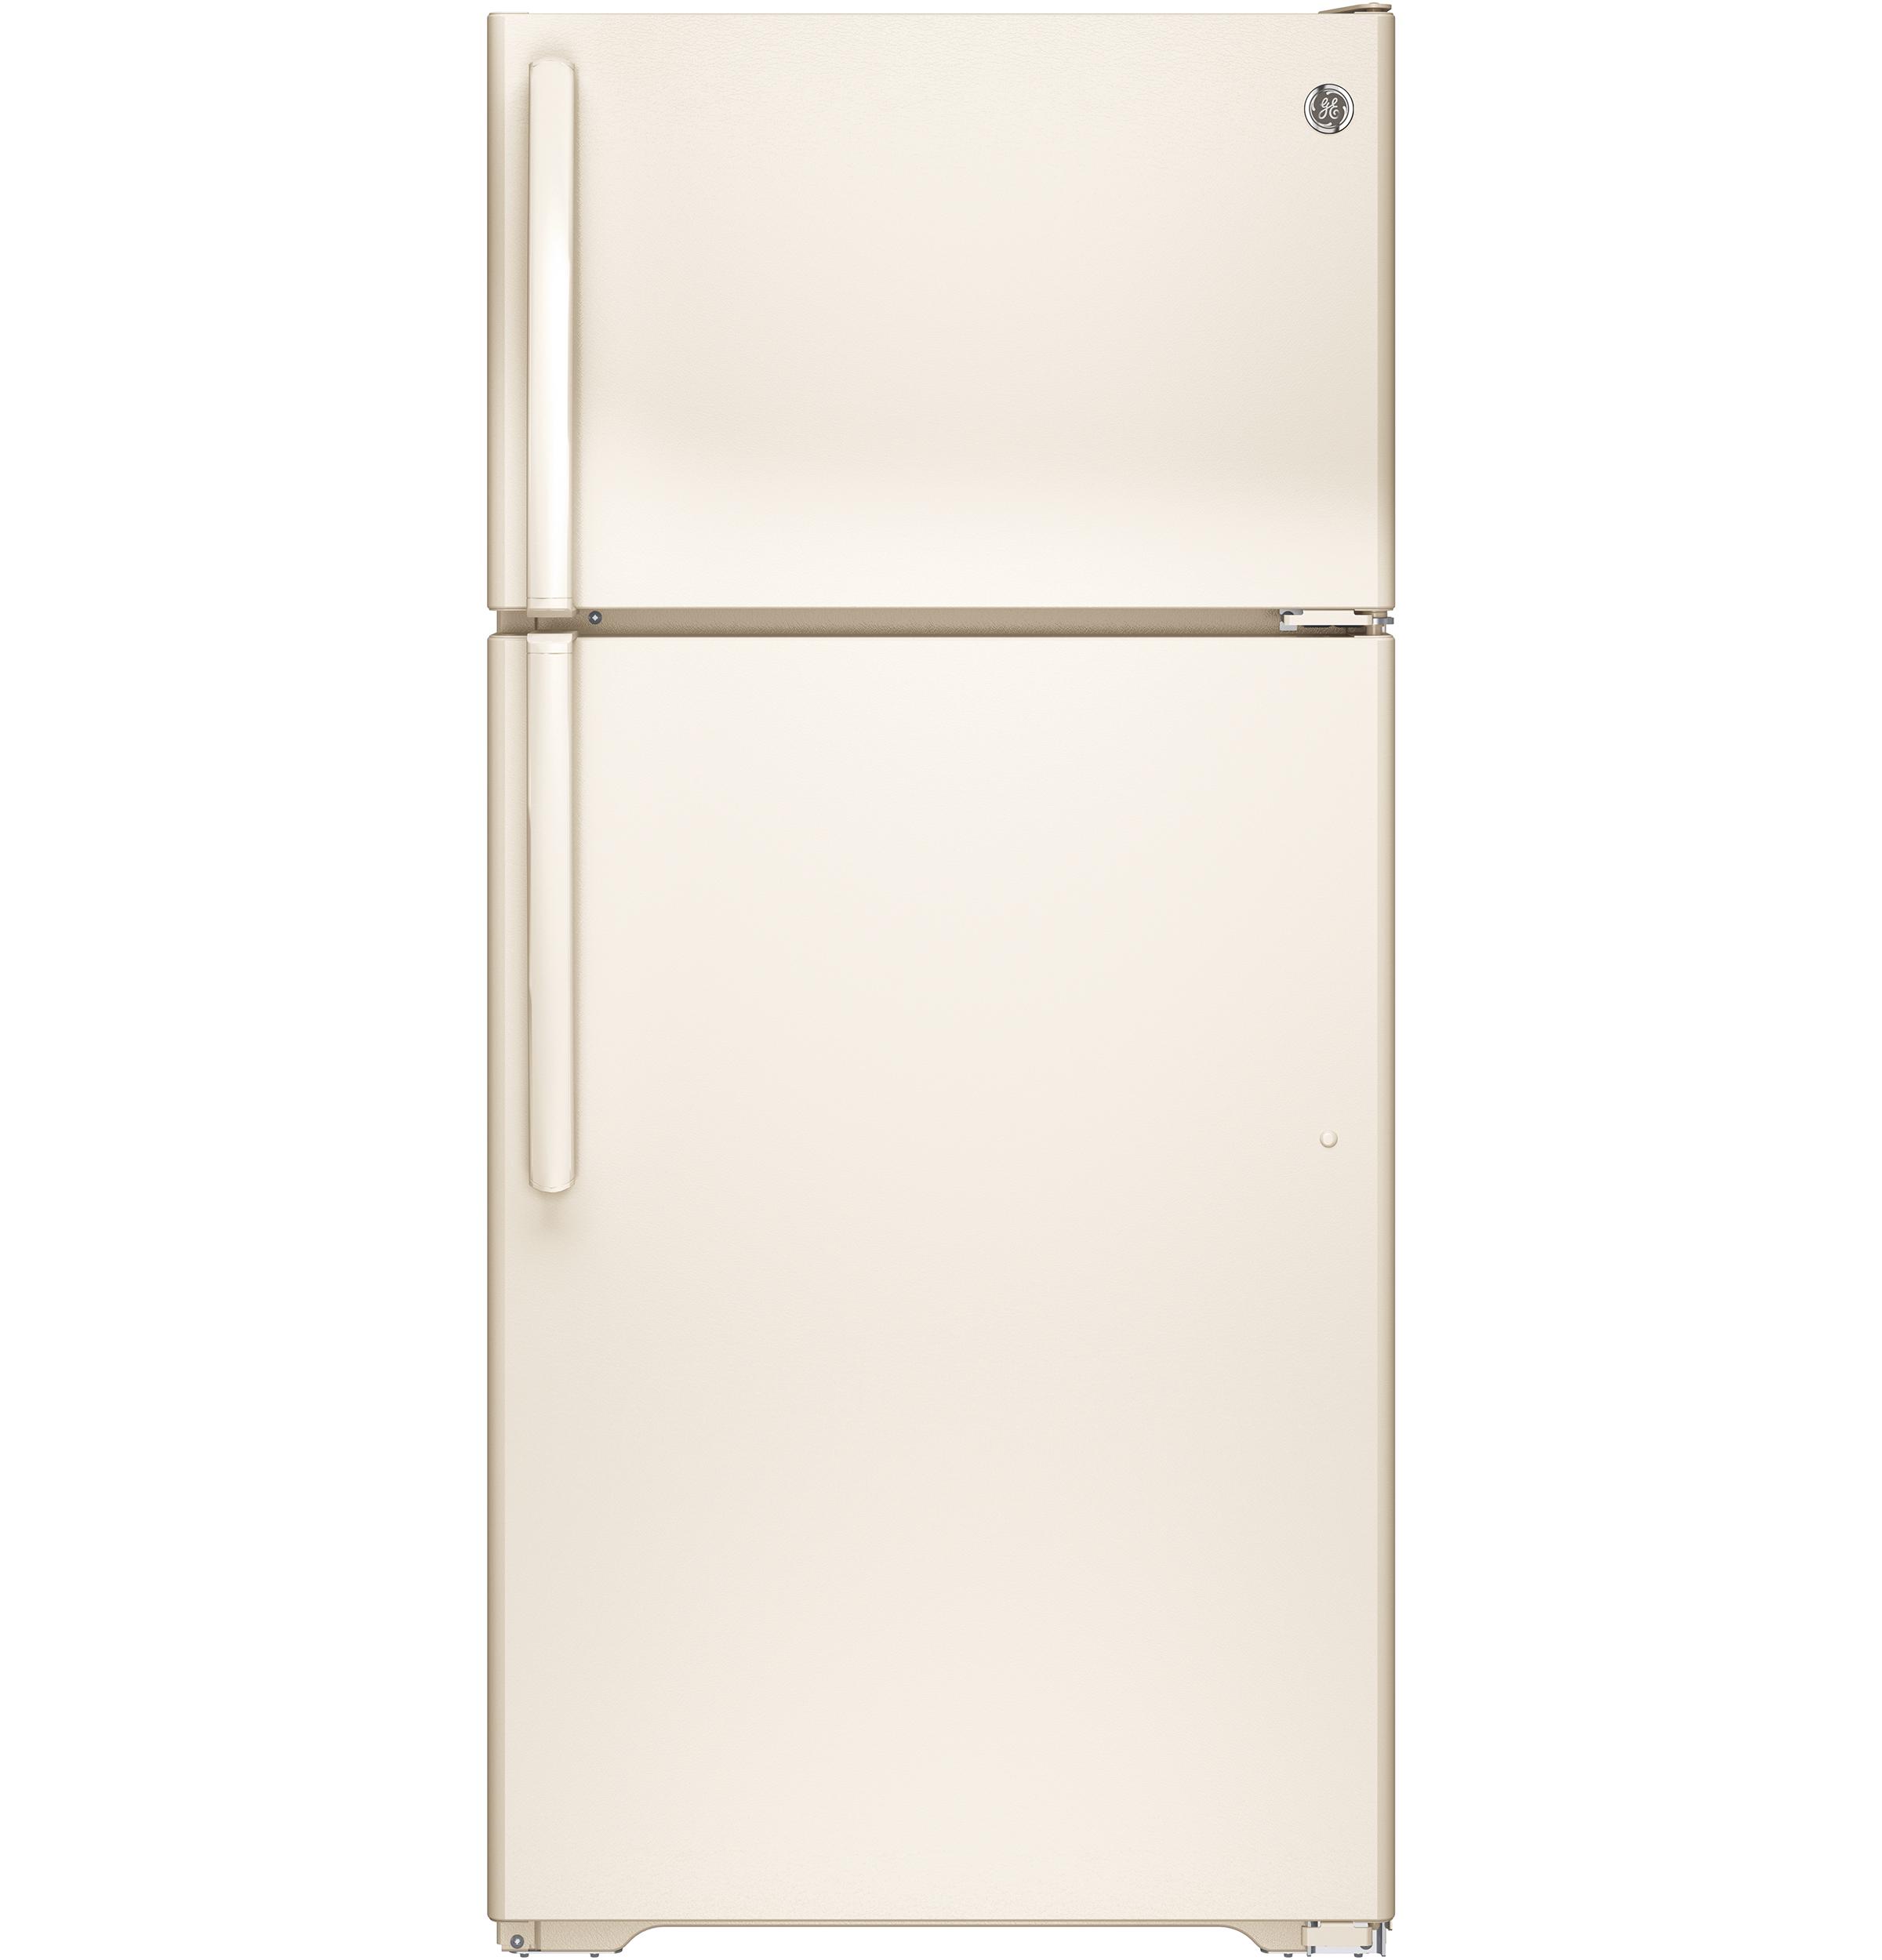 GE GE® ENERGY STAR® 14.6 Cu. Ft. Top-Freezer Refrigerator